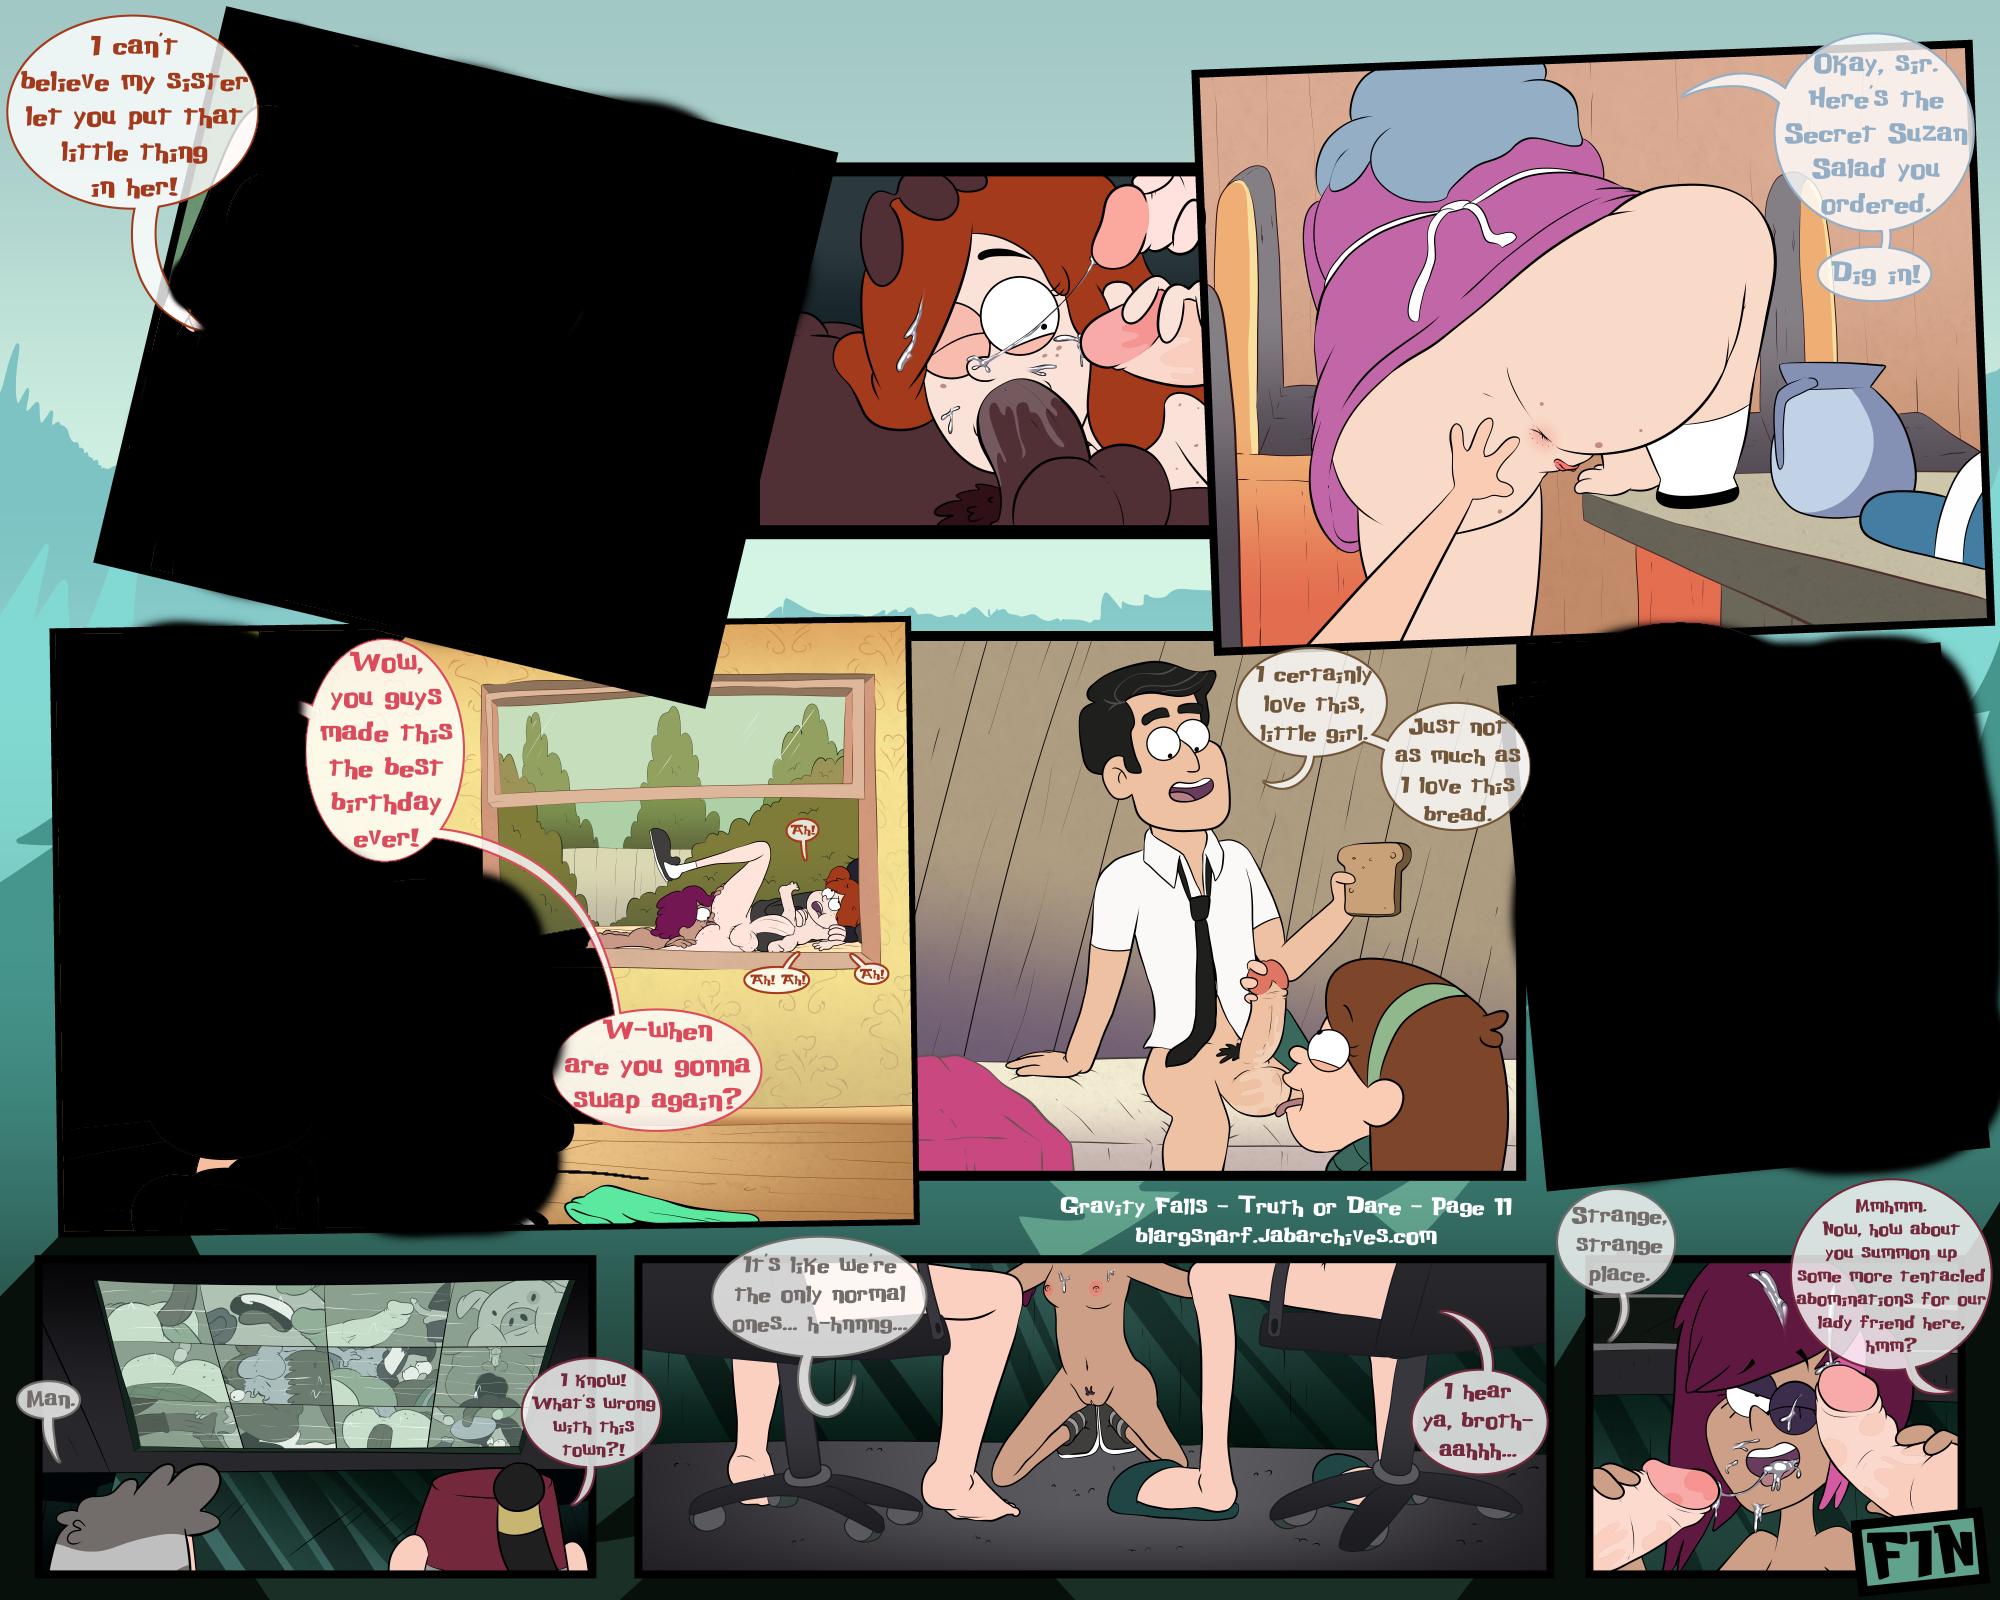 Truth or dare porn comics Oral sex, Anal Sex, BDSM, Bestiality, Blowjob, Creampie, Cum Shots, Cum Swallow, cunnilingus, Double Penetration, Gangbang, Group Sex, incest, Lesbians, Lolicon, Masturbation, MILF, Straight, Straight Shota